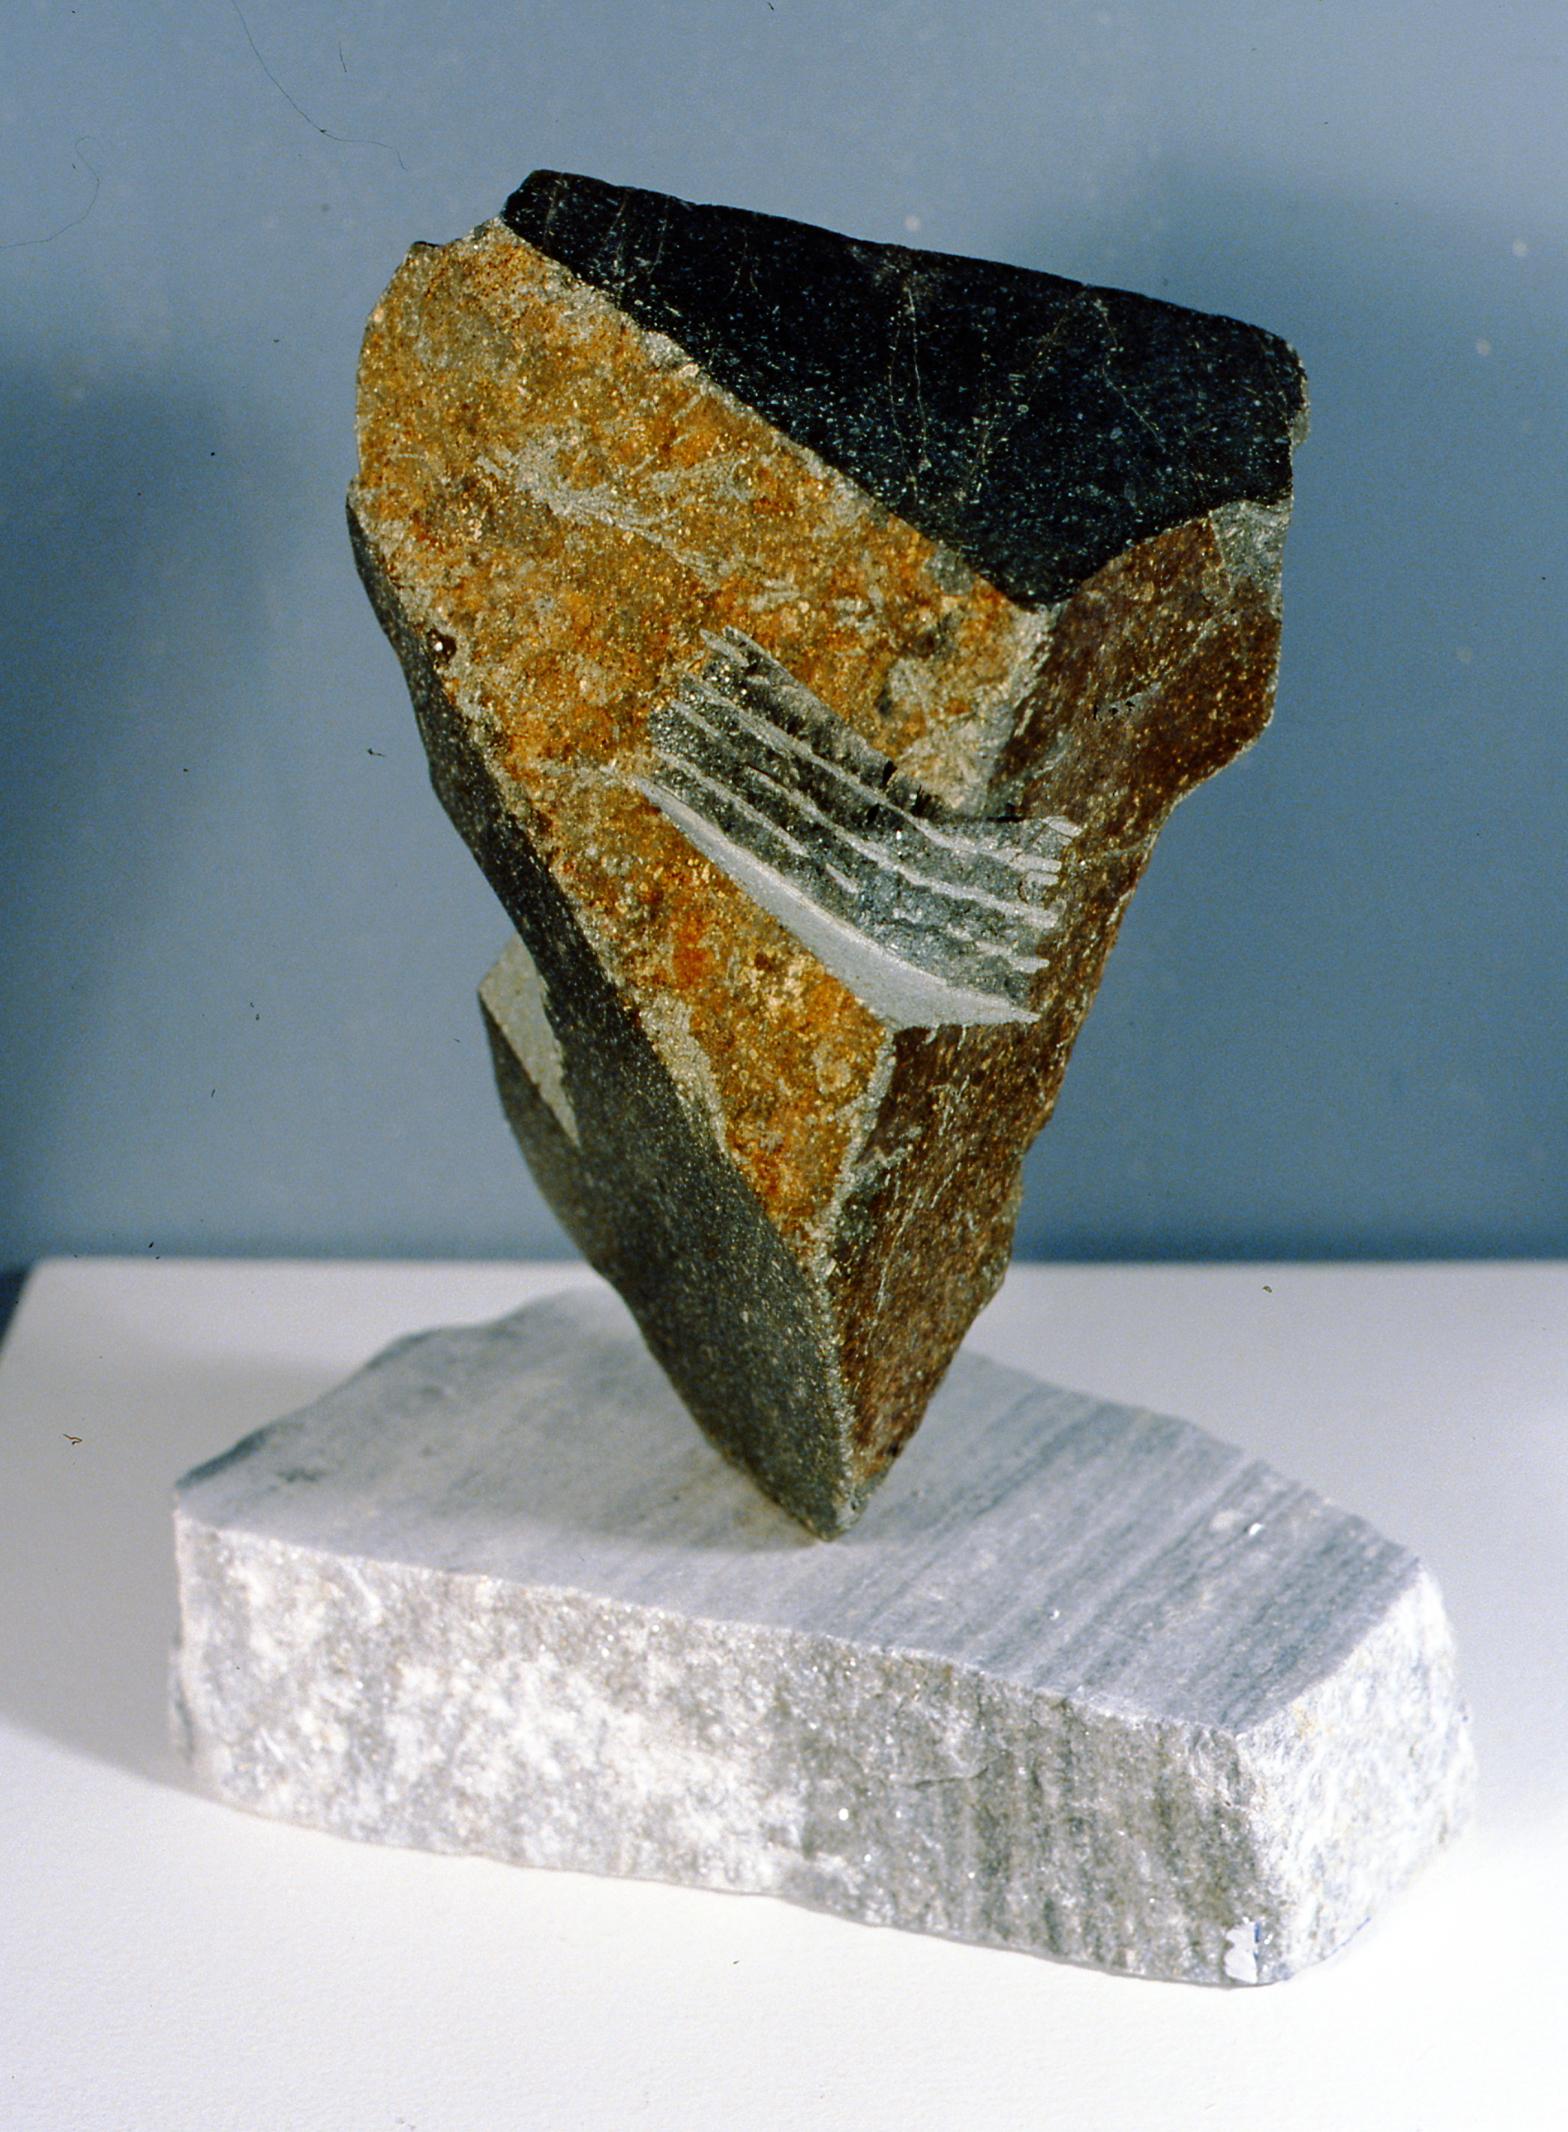 Uncarved Bock: Okanagan (view 1),2002, Jon Barlow Hudson, rock sculpture, 35 cm tall, 2002.06.01, gift of the artist